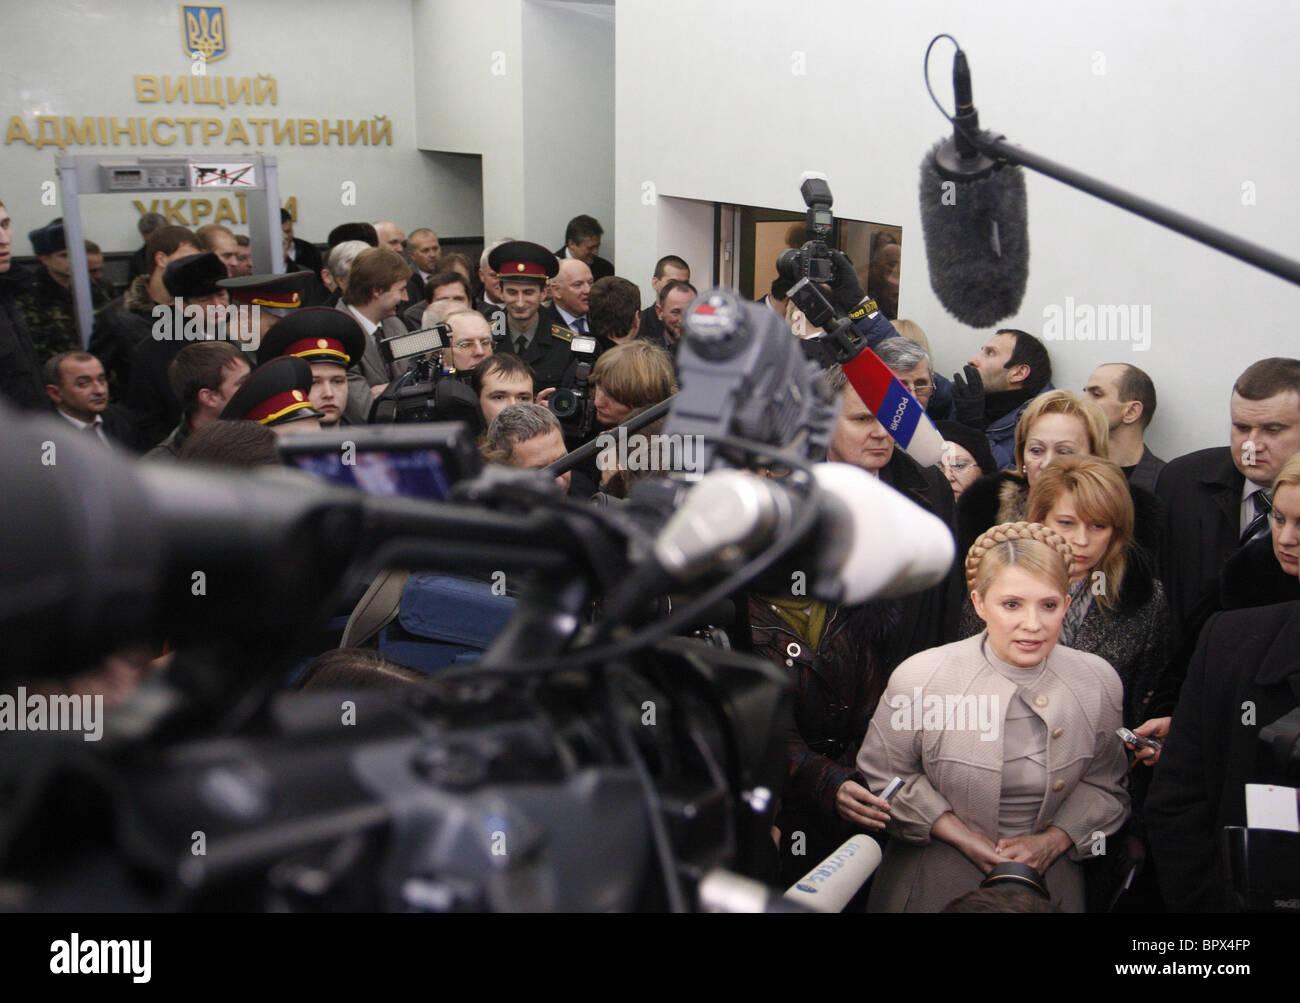 Tymoshenko sfide Ucraina elezioni presidenziali risultato in tribunale Foto Stock